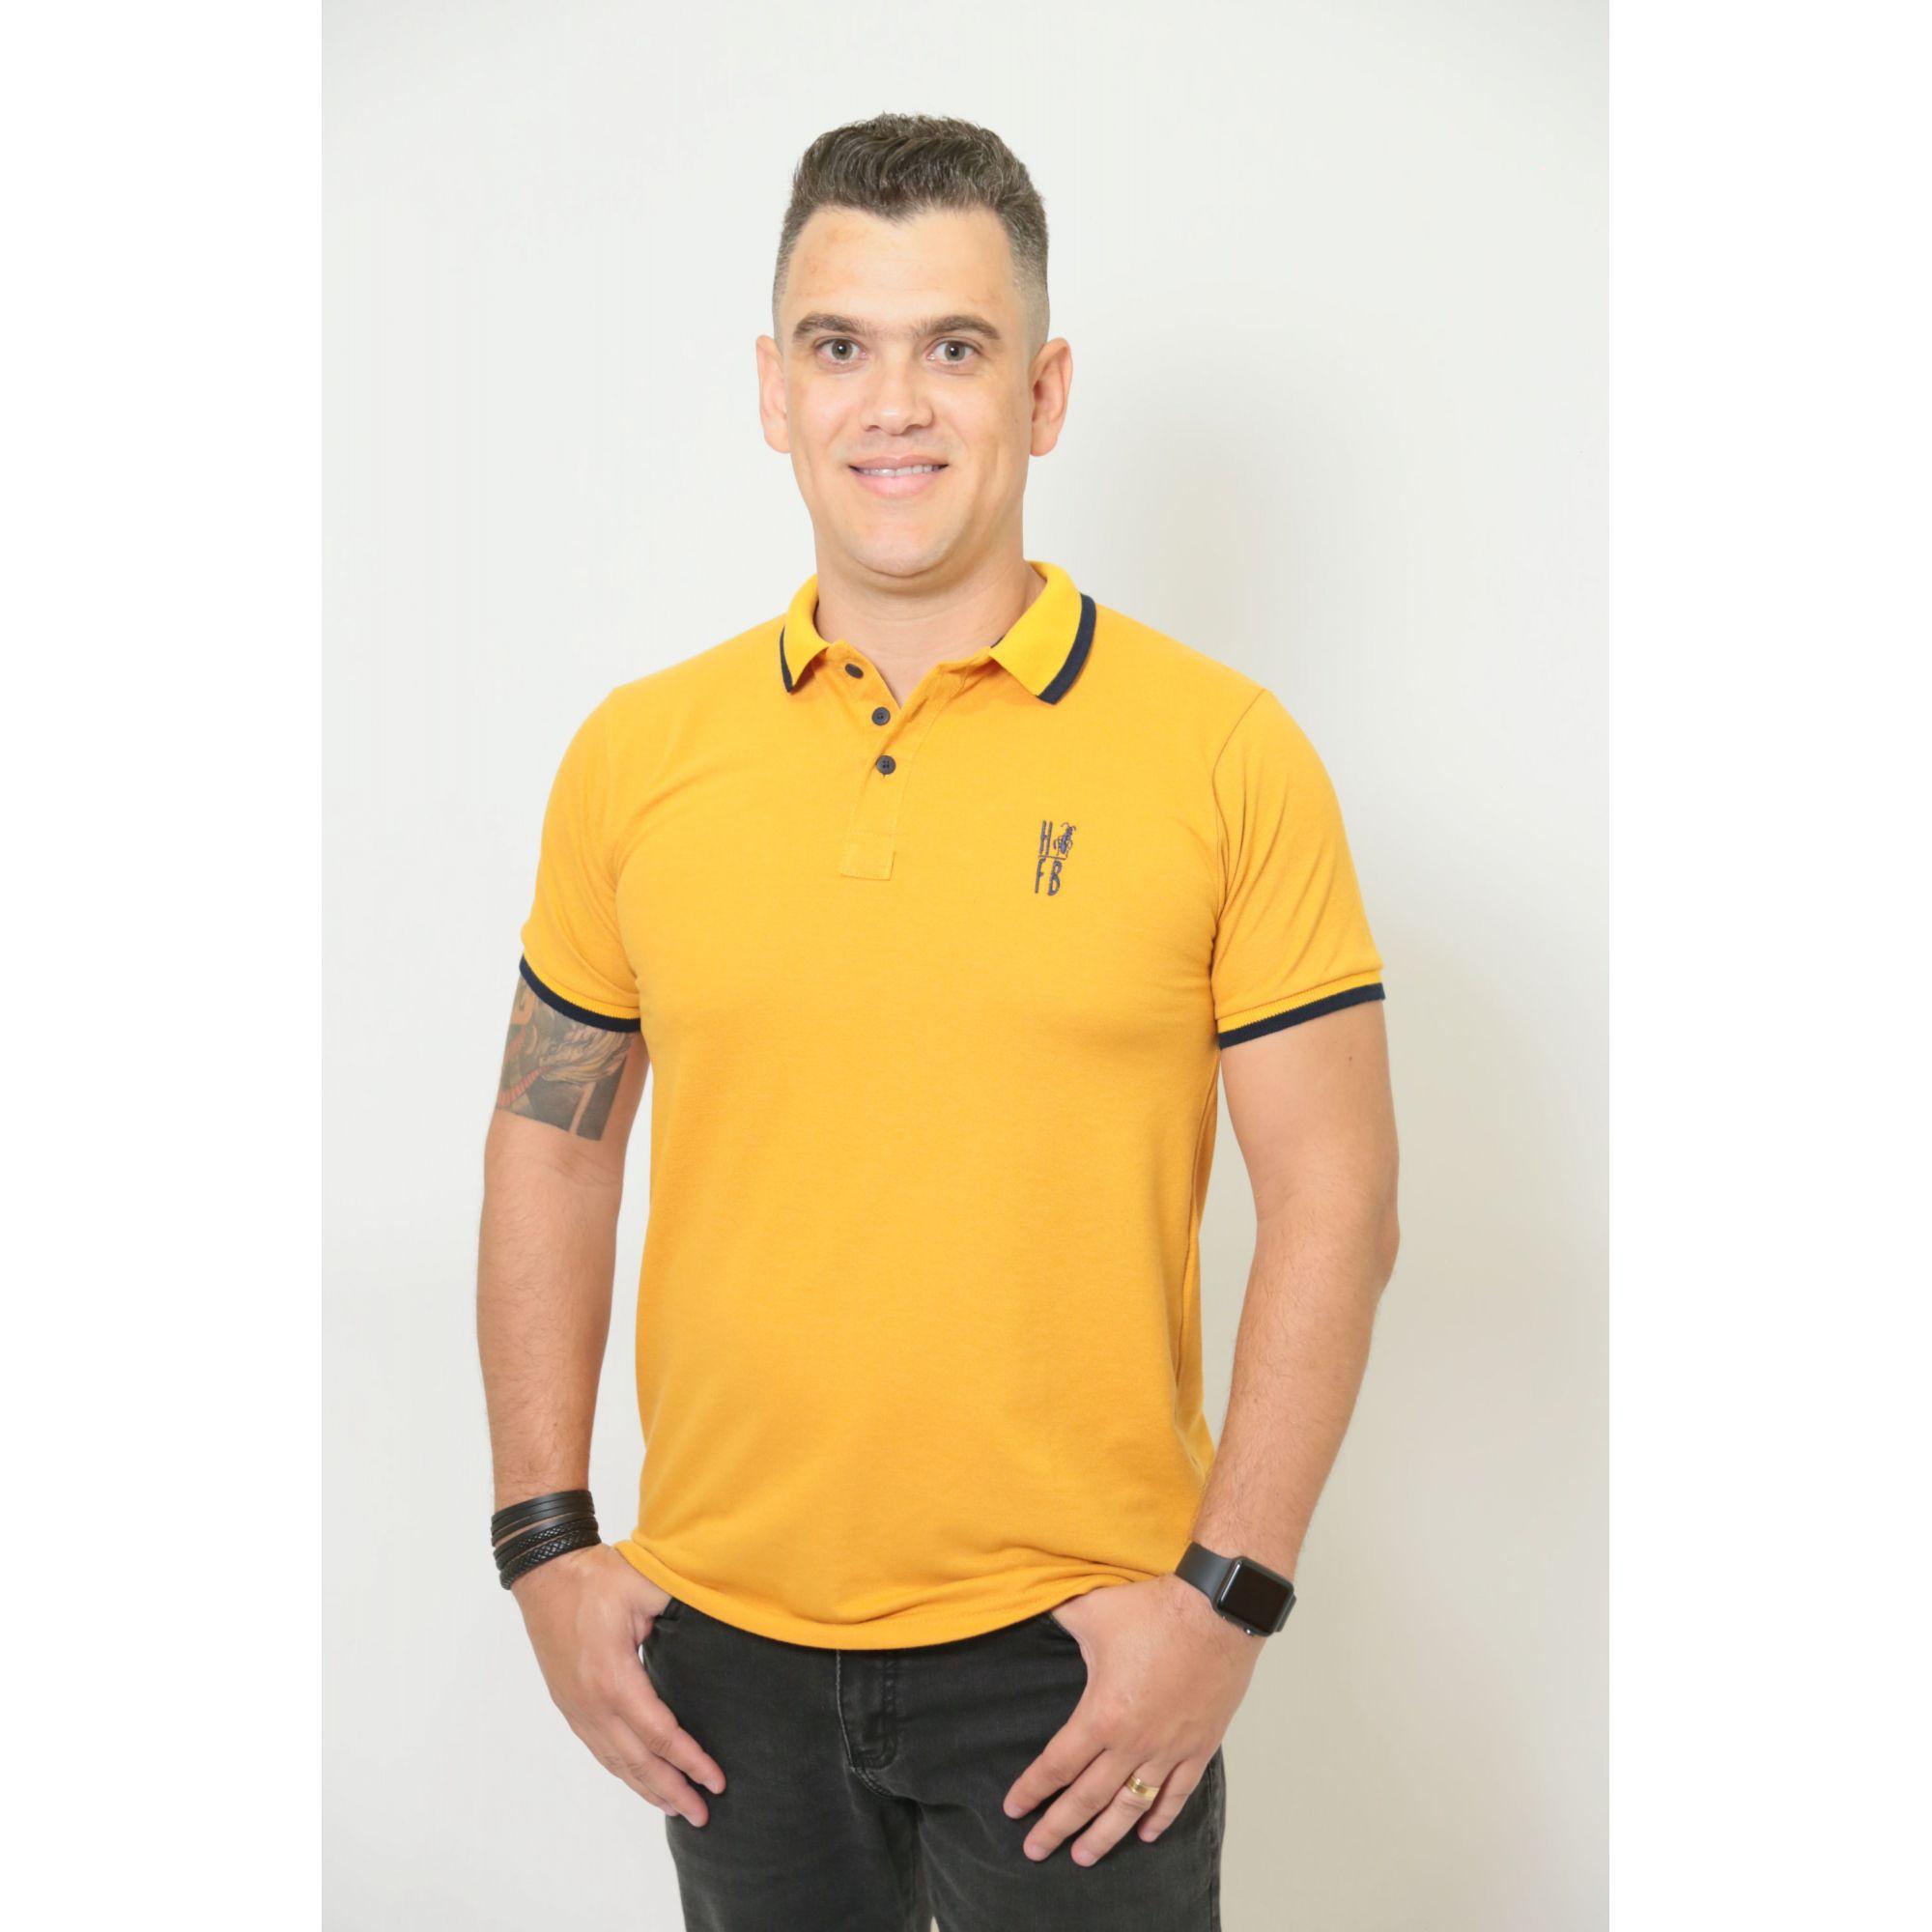 PAI E FILHA > Kit Camisa + Vestido Polo Mostarda [Coleção Tal Pai Tal Filha]  - Heitor Fashion Brazil